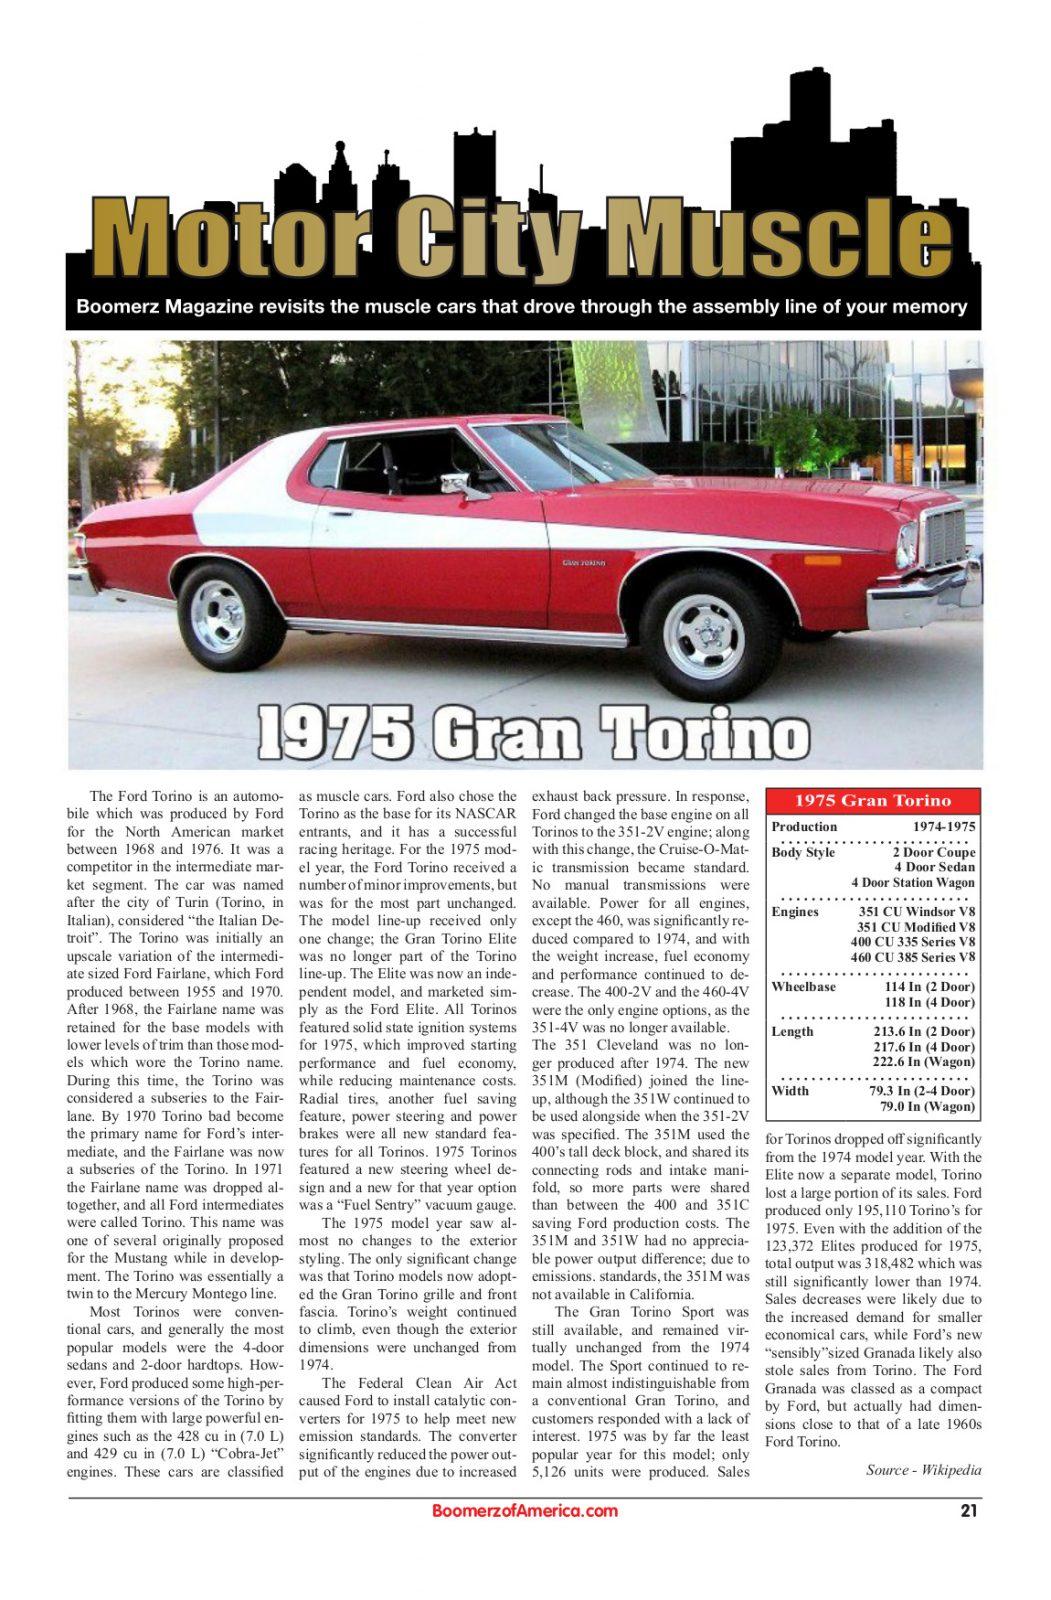 Motor City Muscle 1975 Gran Torino